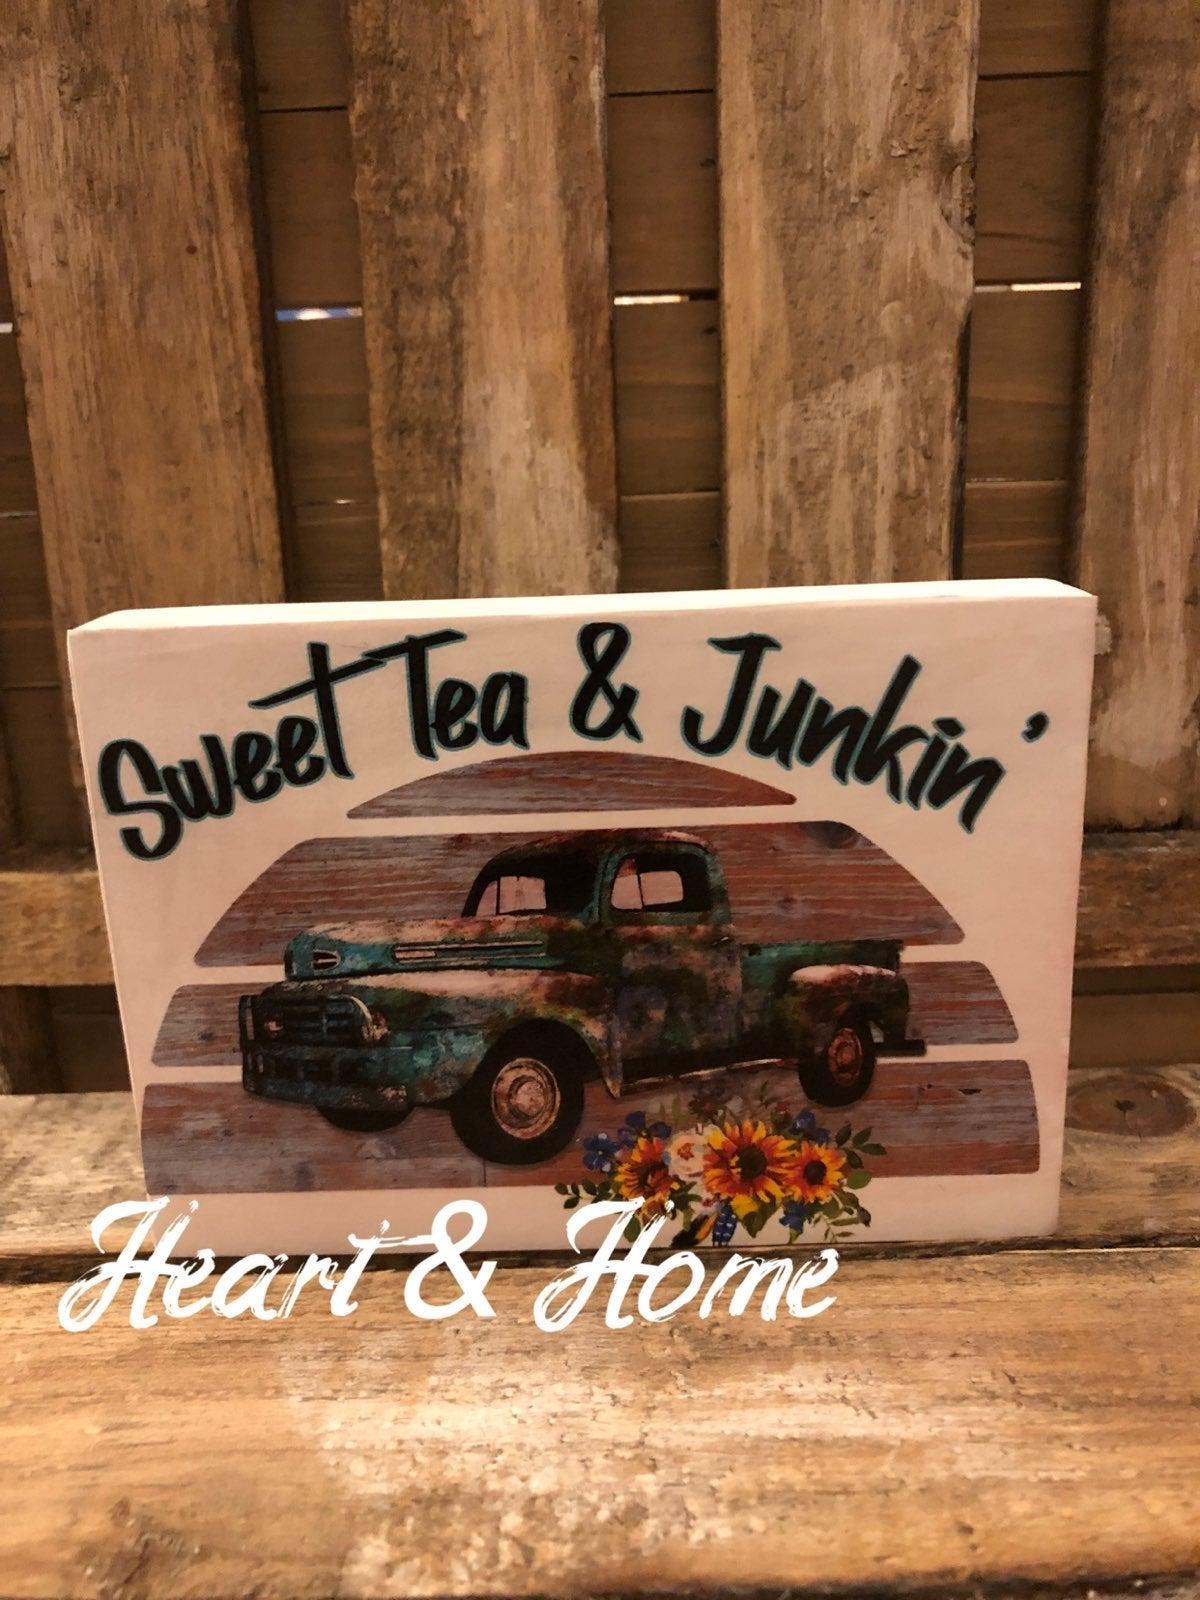 Sweet tea & Junkin Tier tray sign